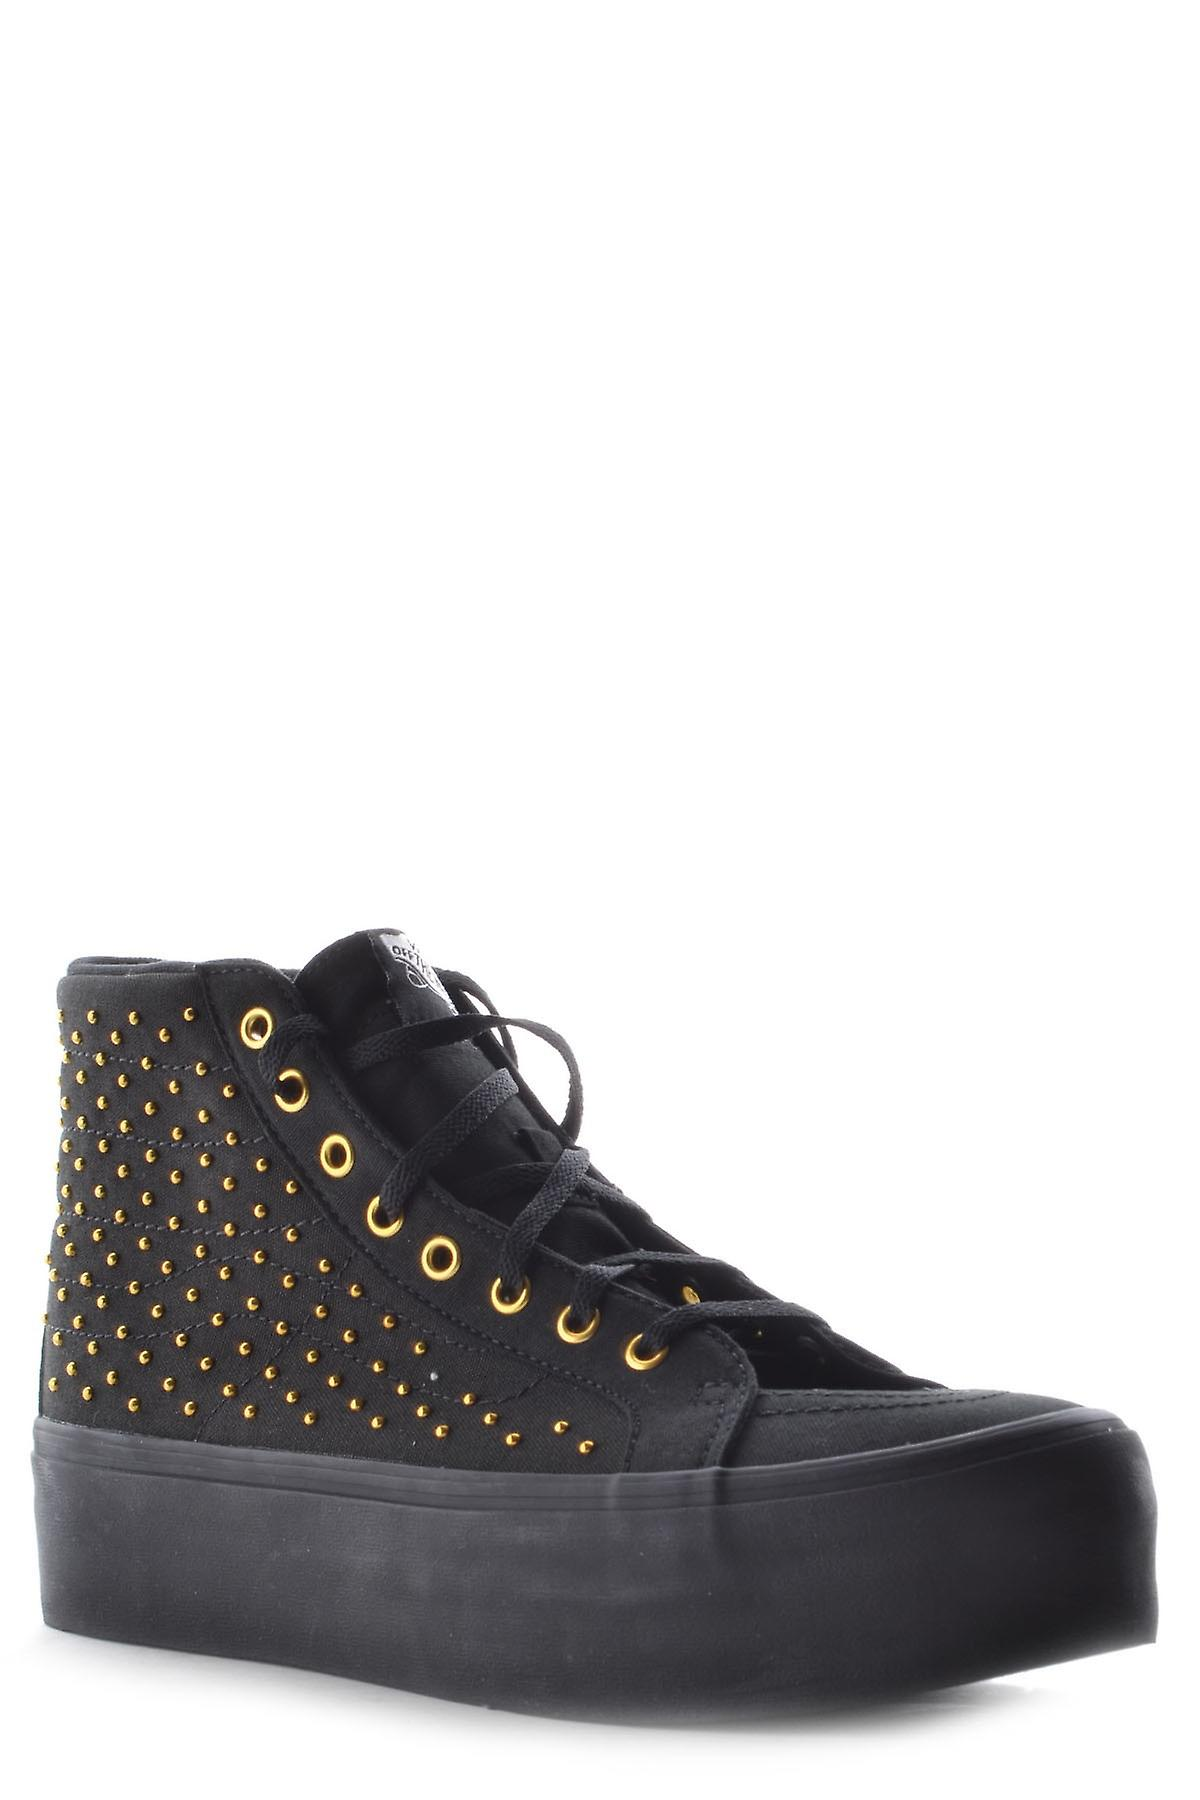 Vans Ezbc071002 Women's Black Fabric Hi Top Sneakers